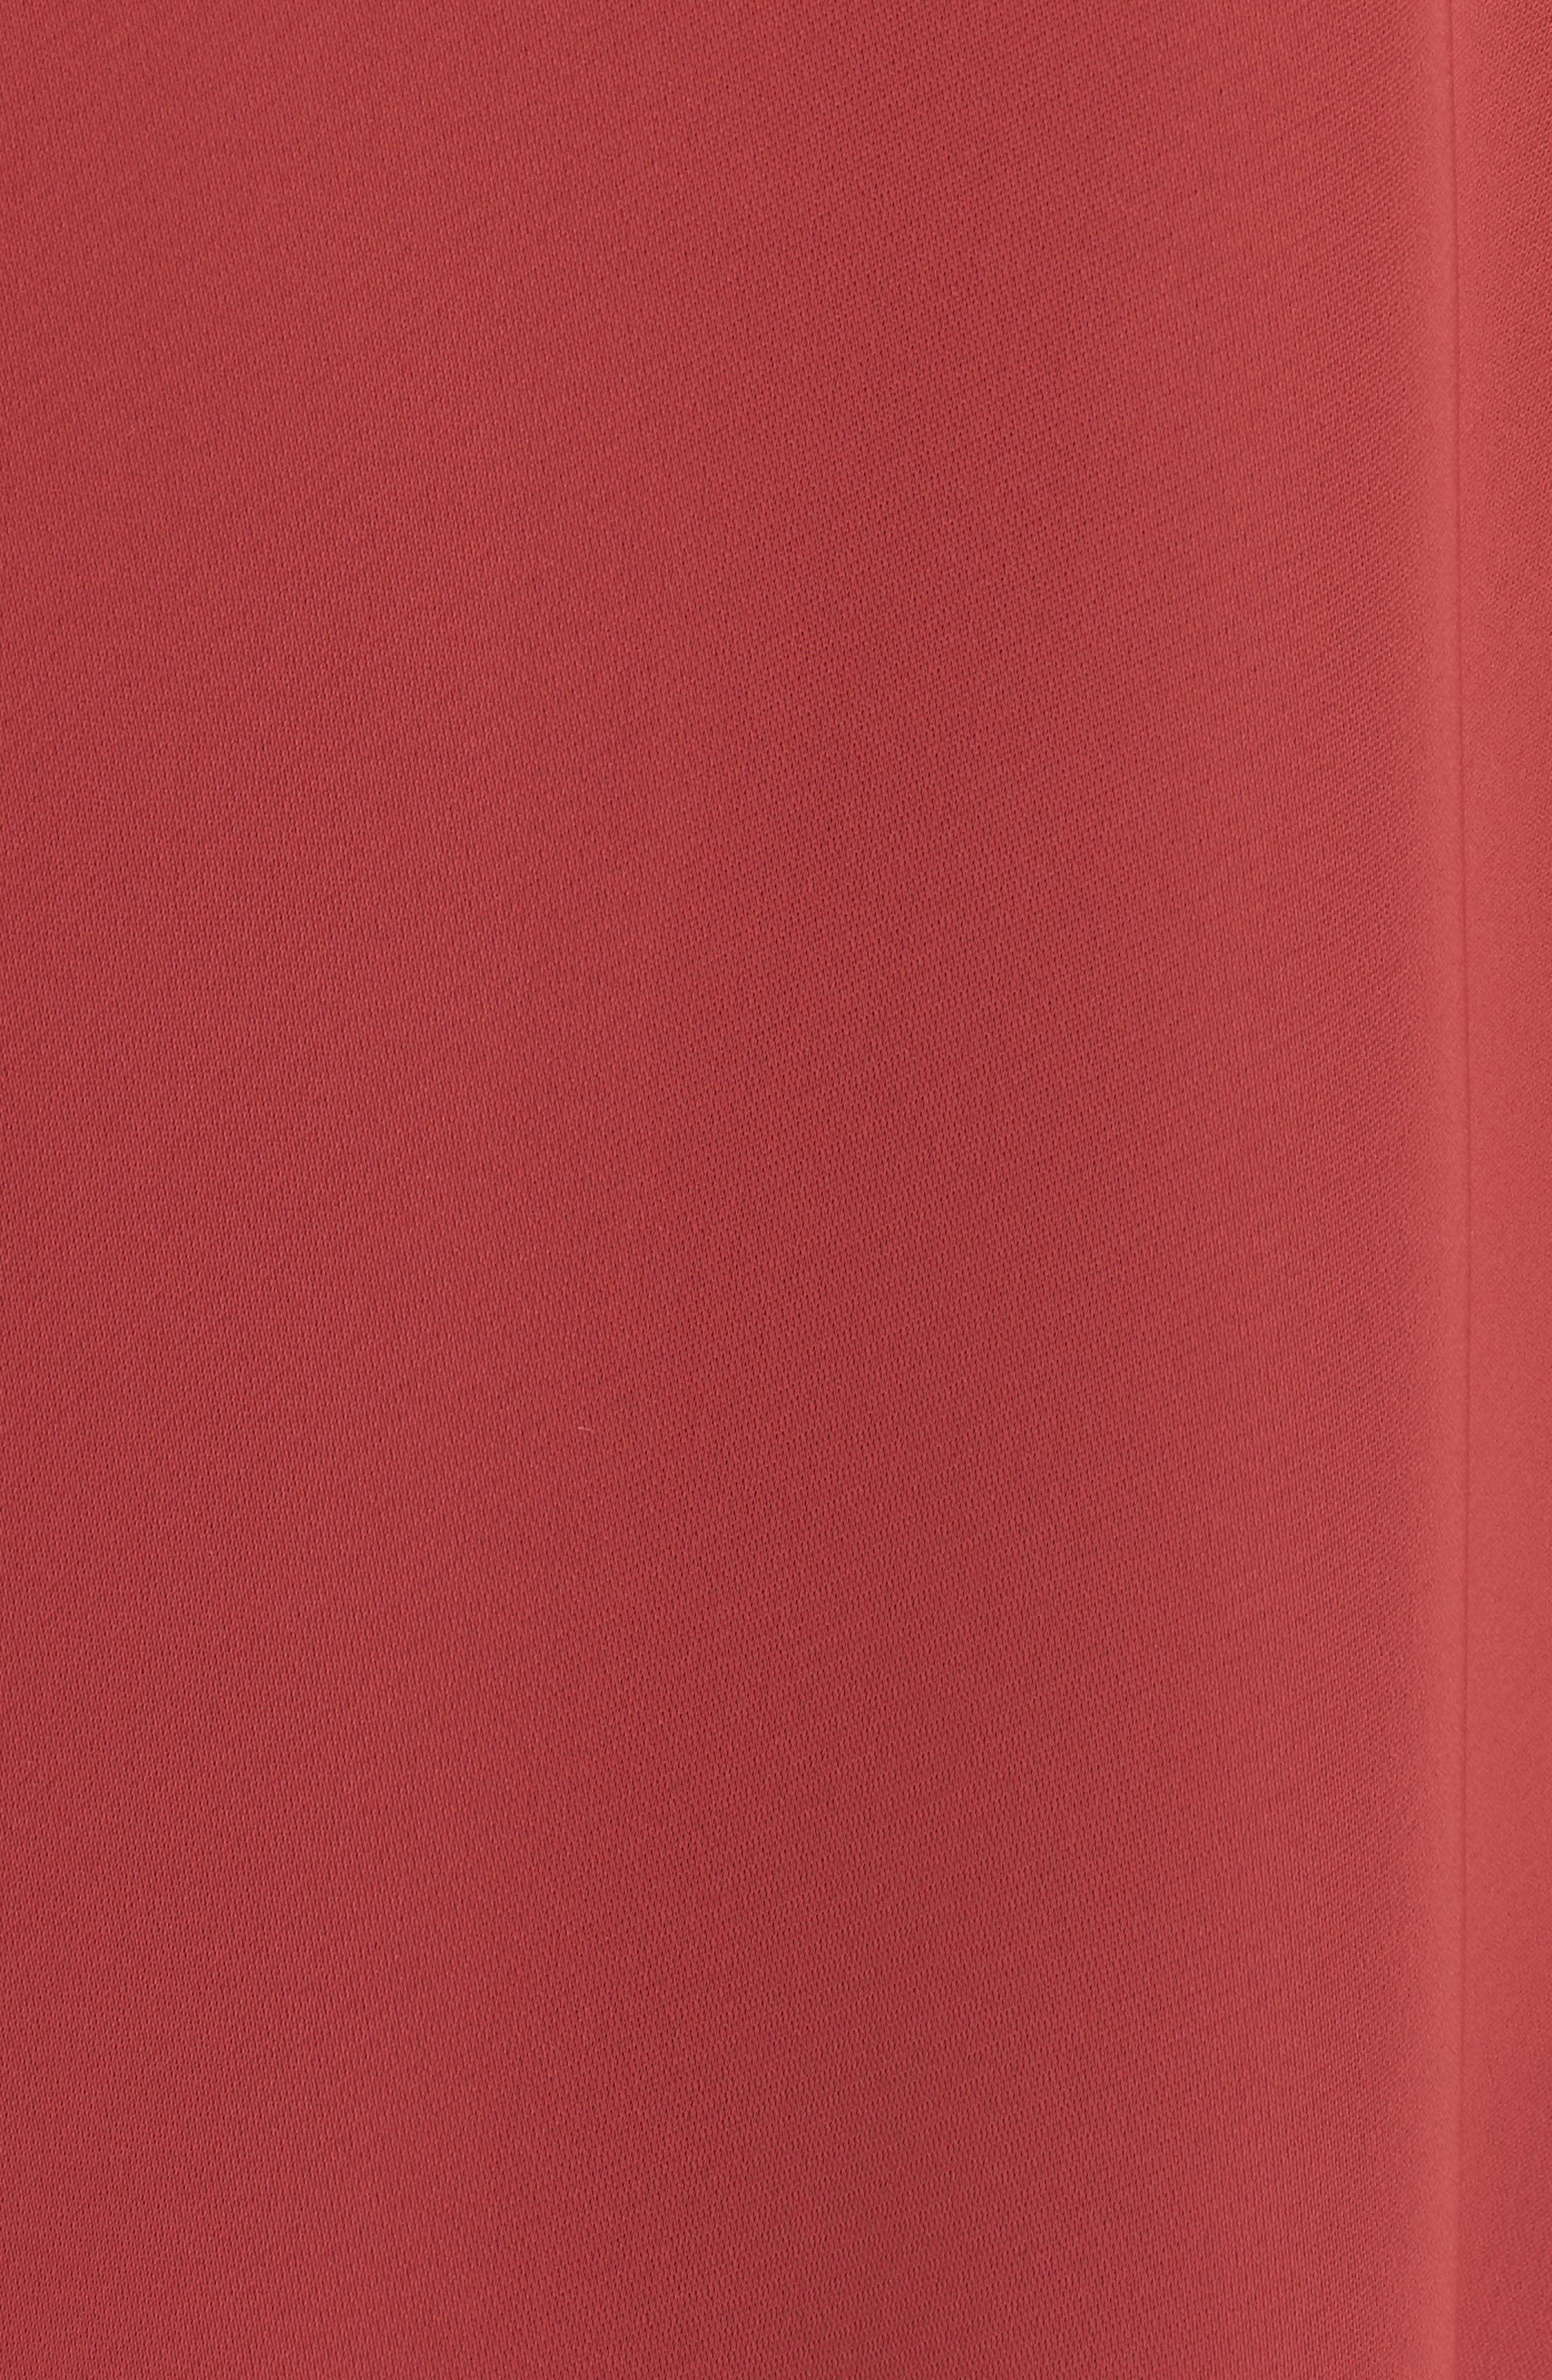 Majestic Matte Satin Blouse,                             Alternate thumbnail 3, color,                             Tamarind